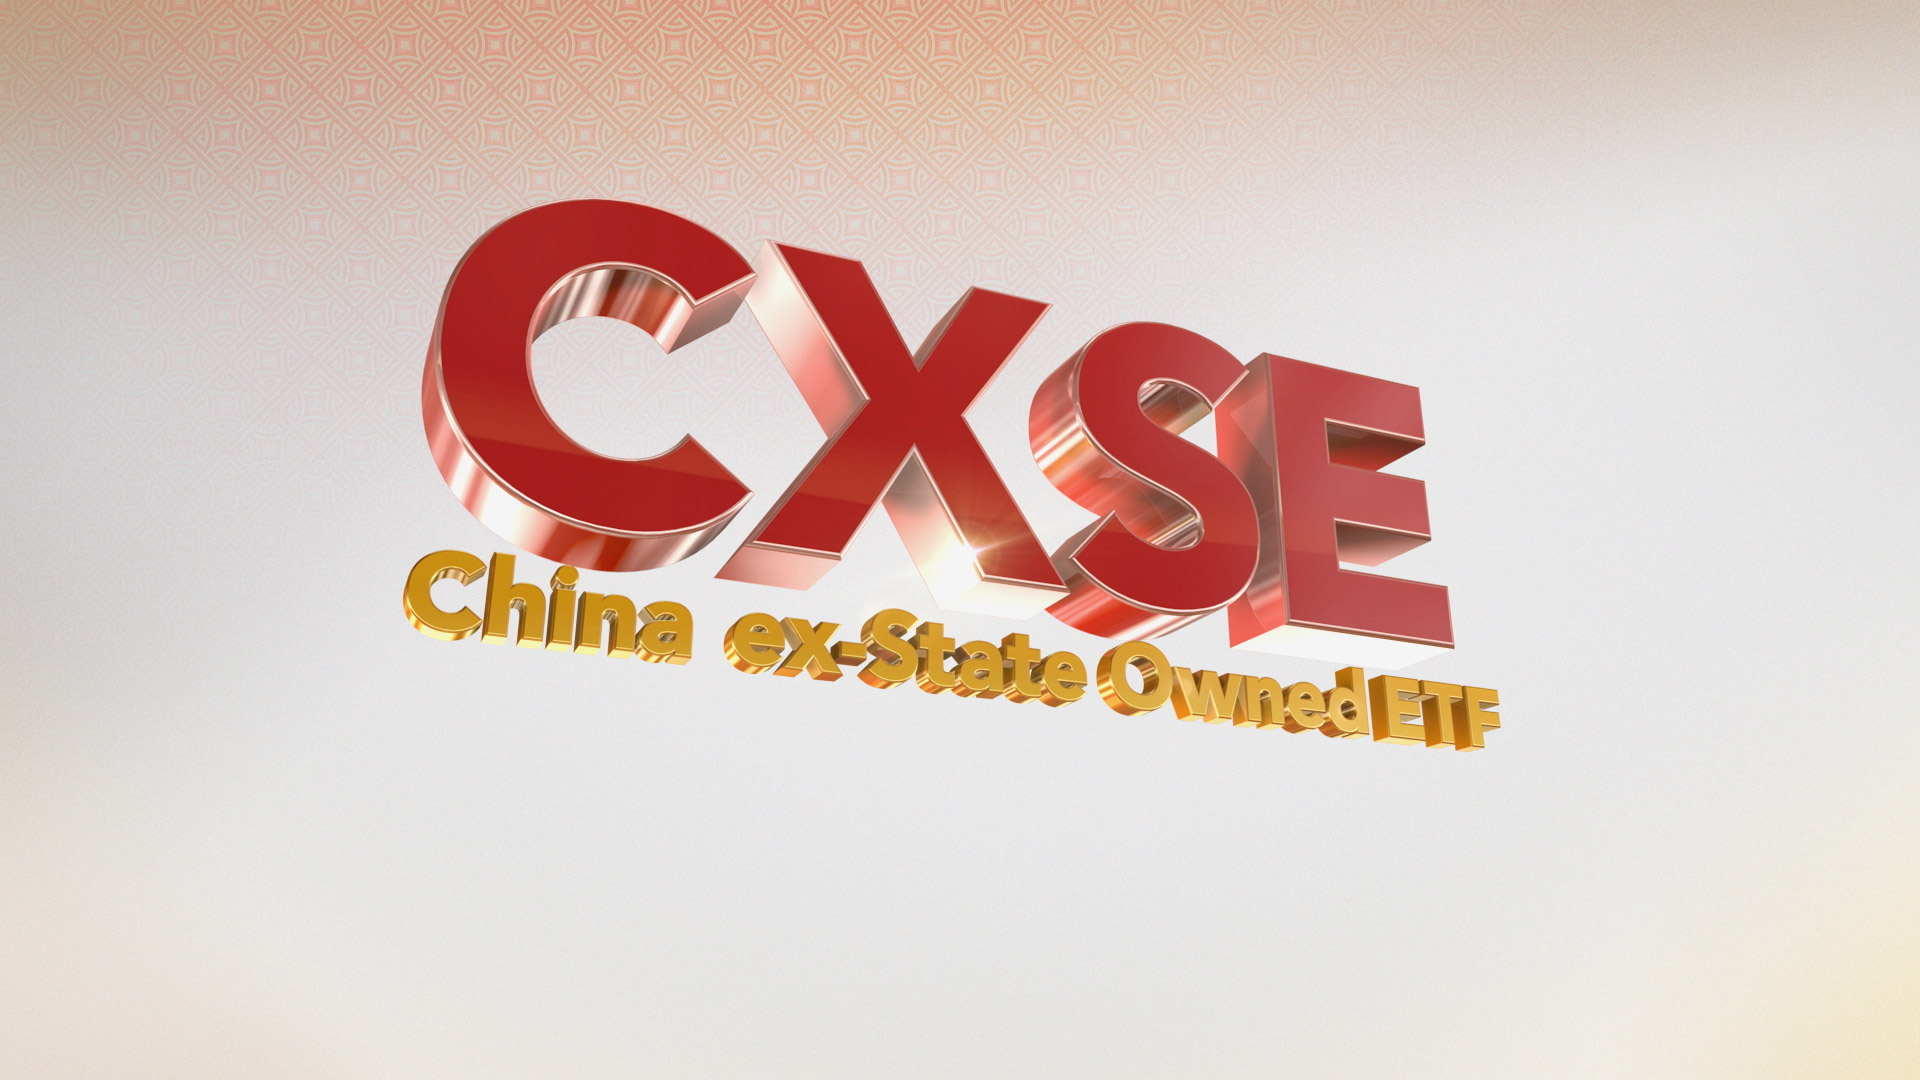 08_AD5985_CXSE_S.jpg